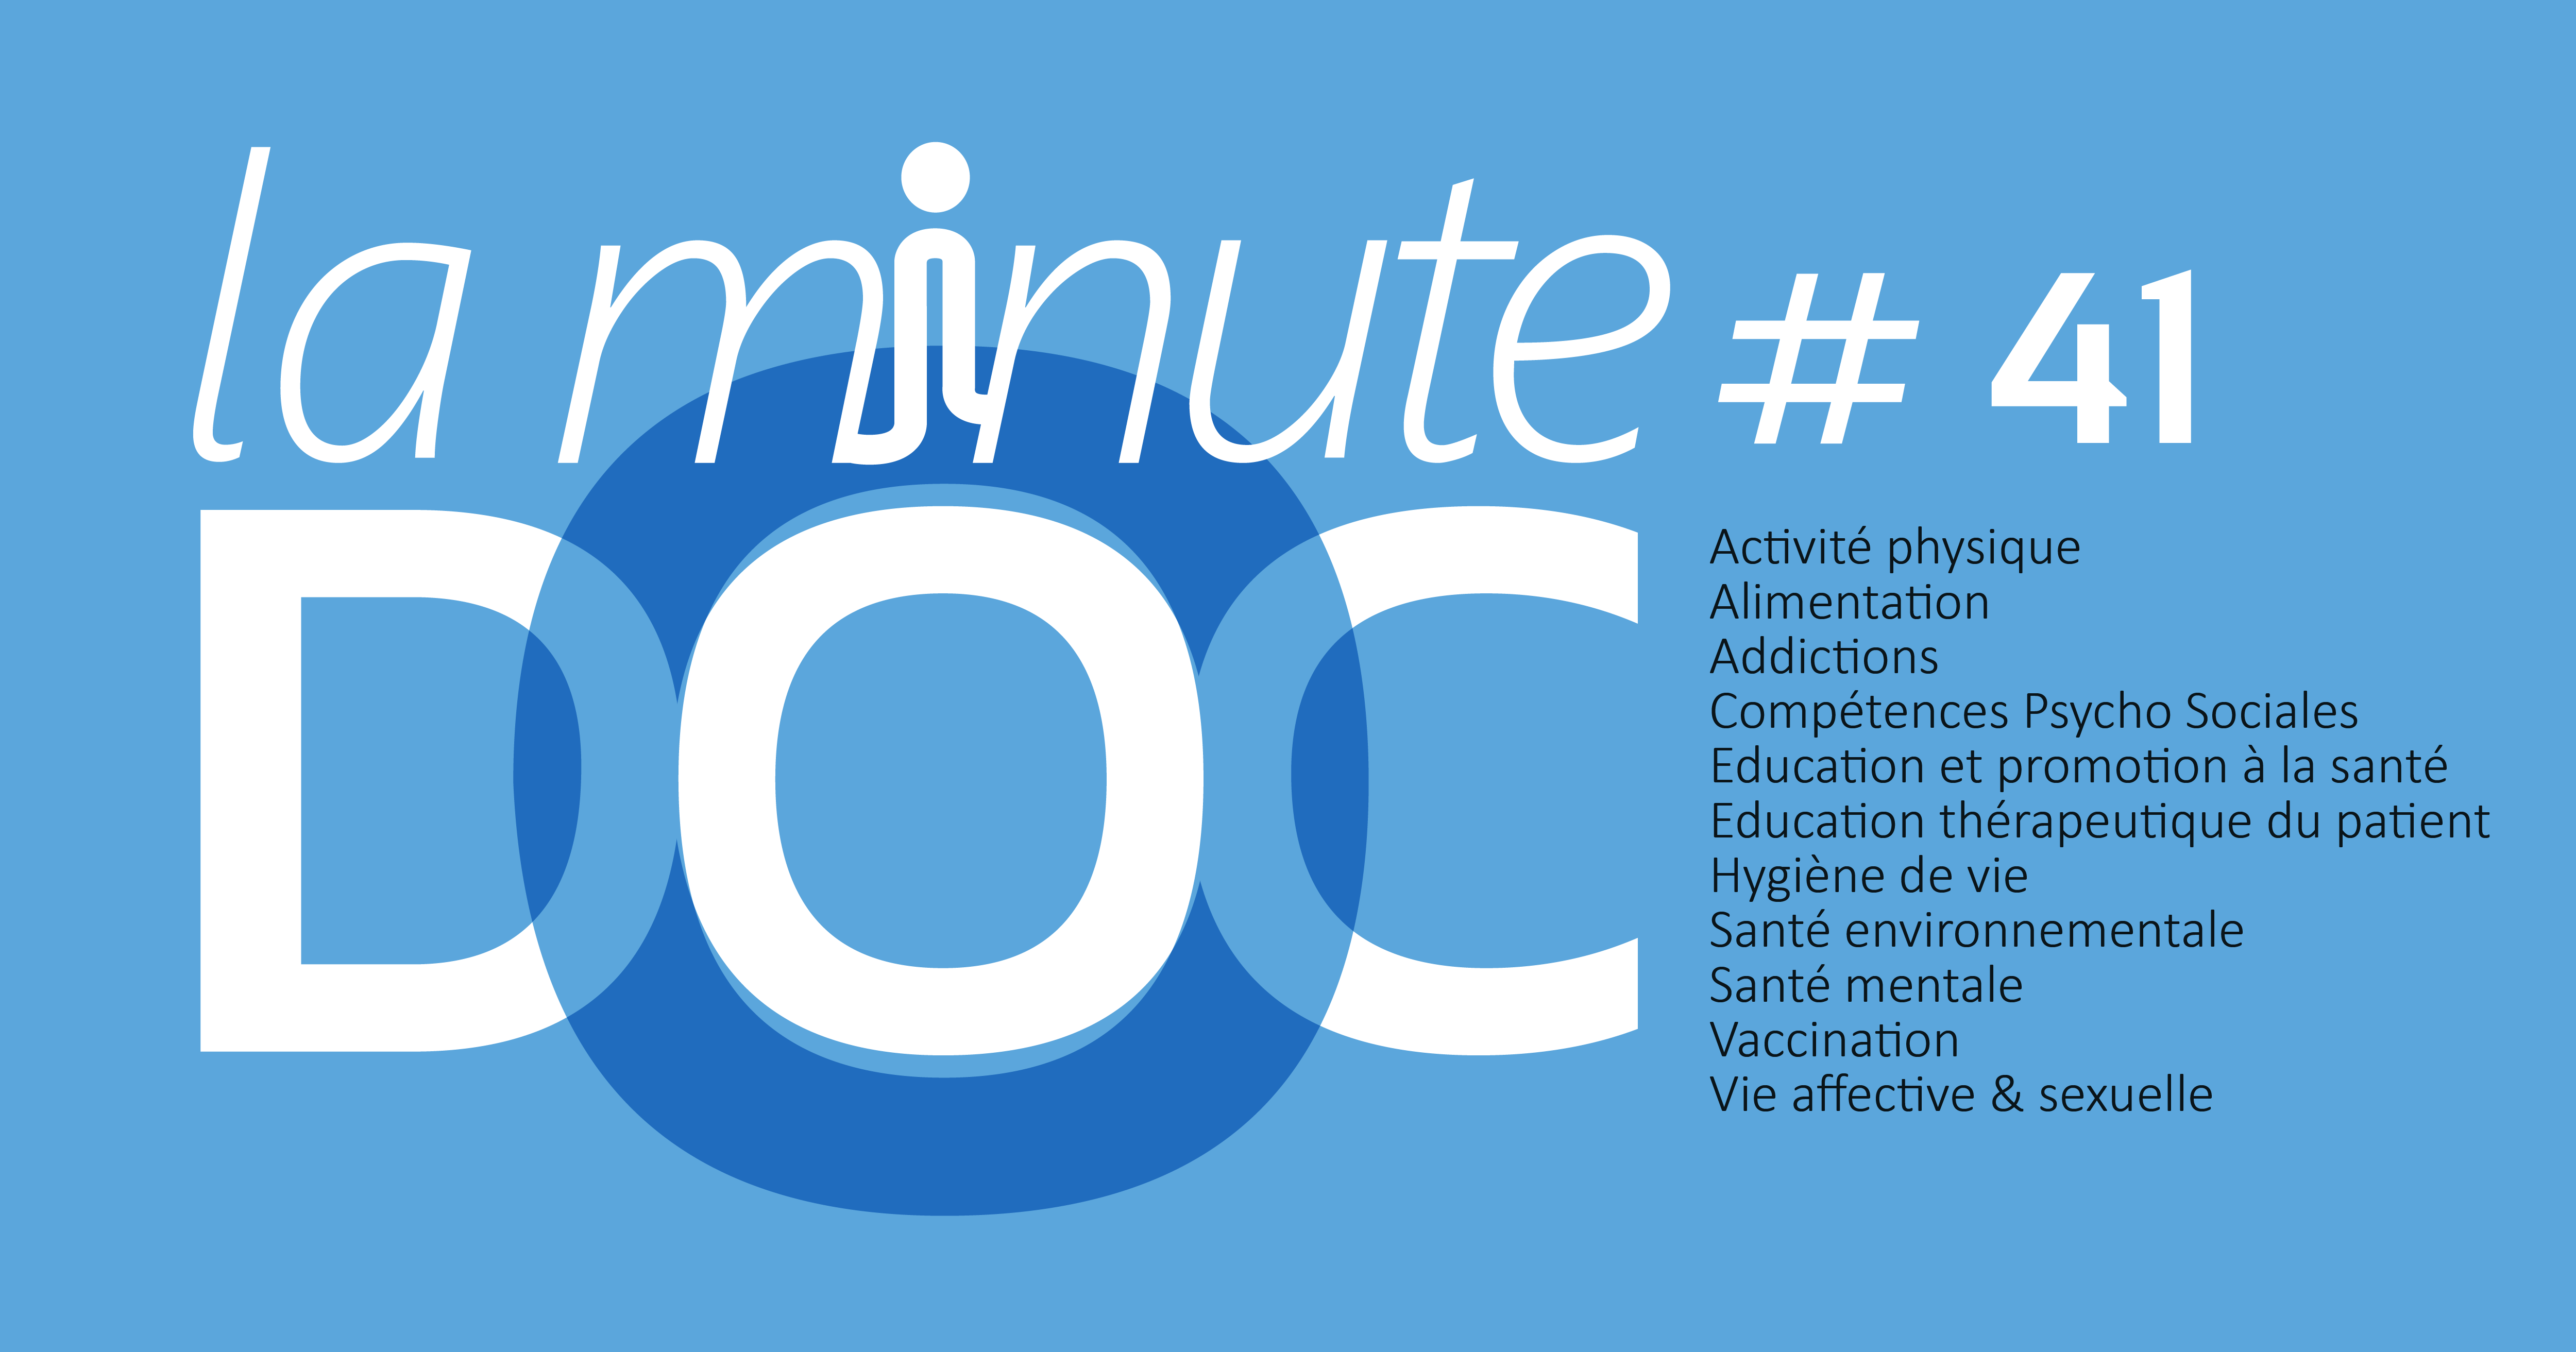 La minute DOC #41